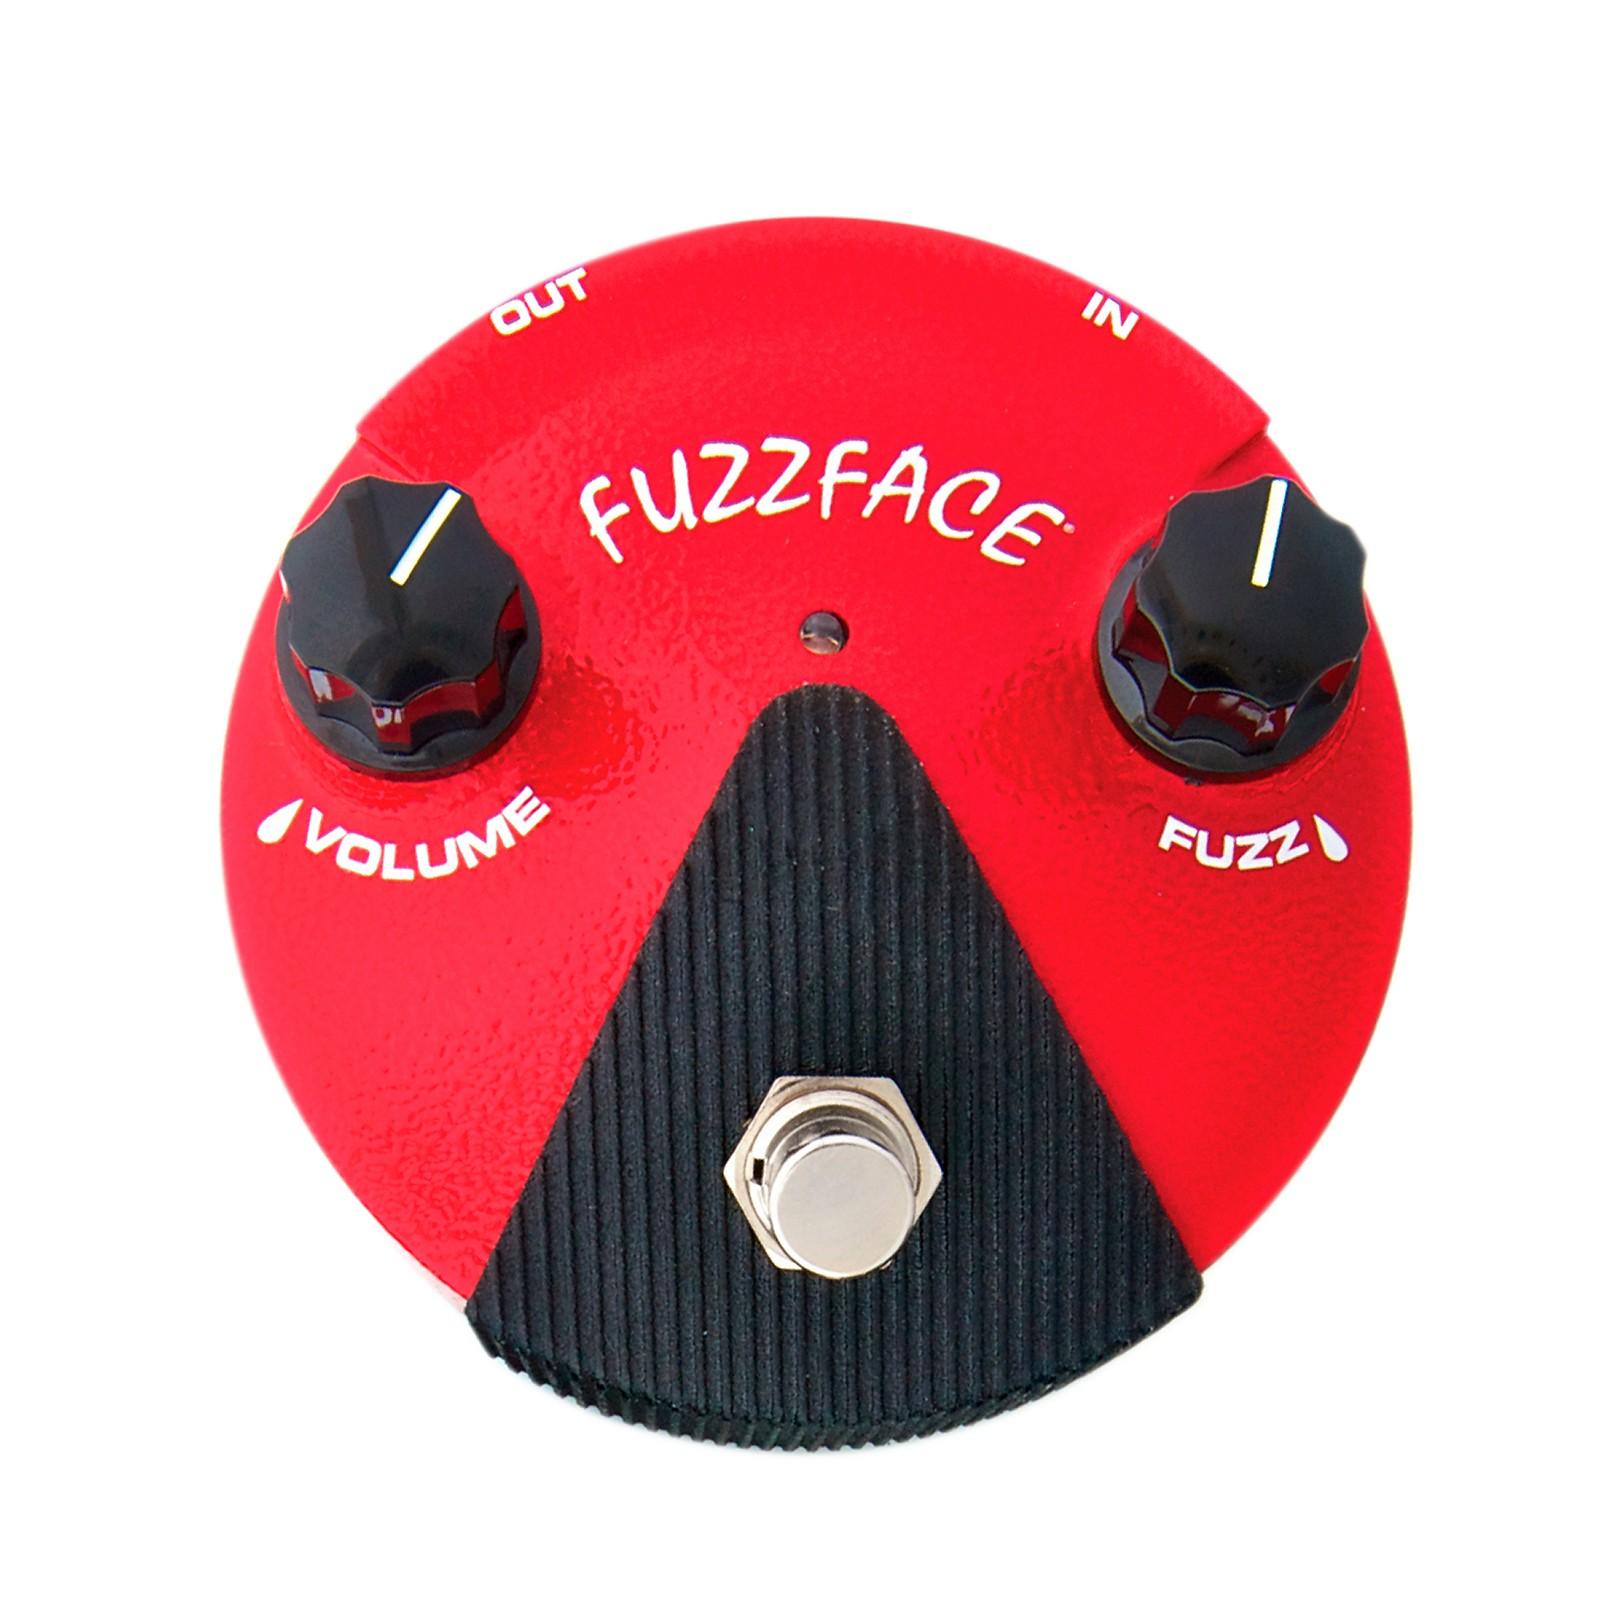 Open Box Dunlop Germanium Fuzz Face Mini Red Guitar Effects Pedal